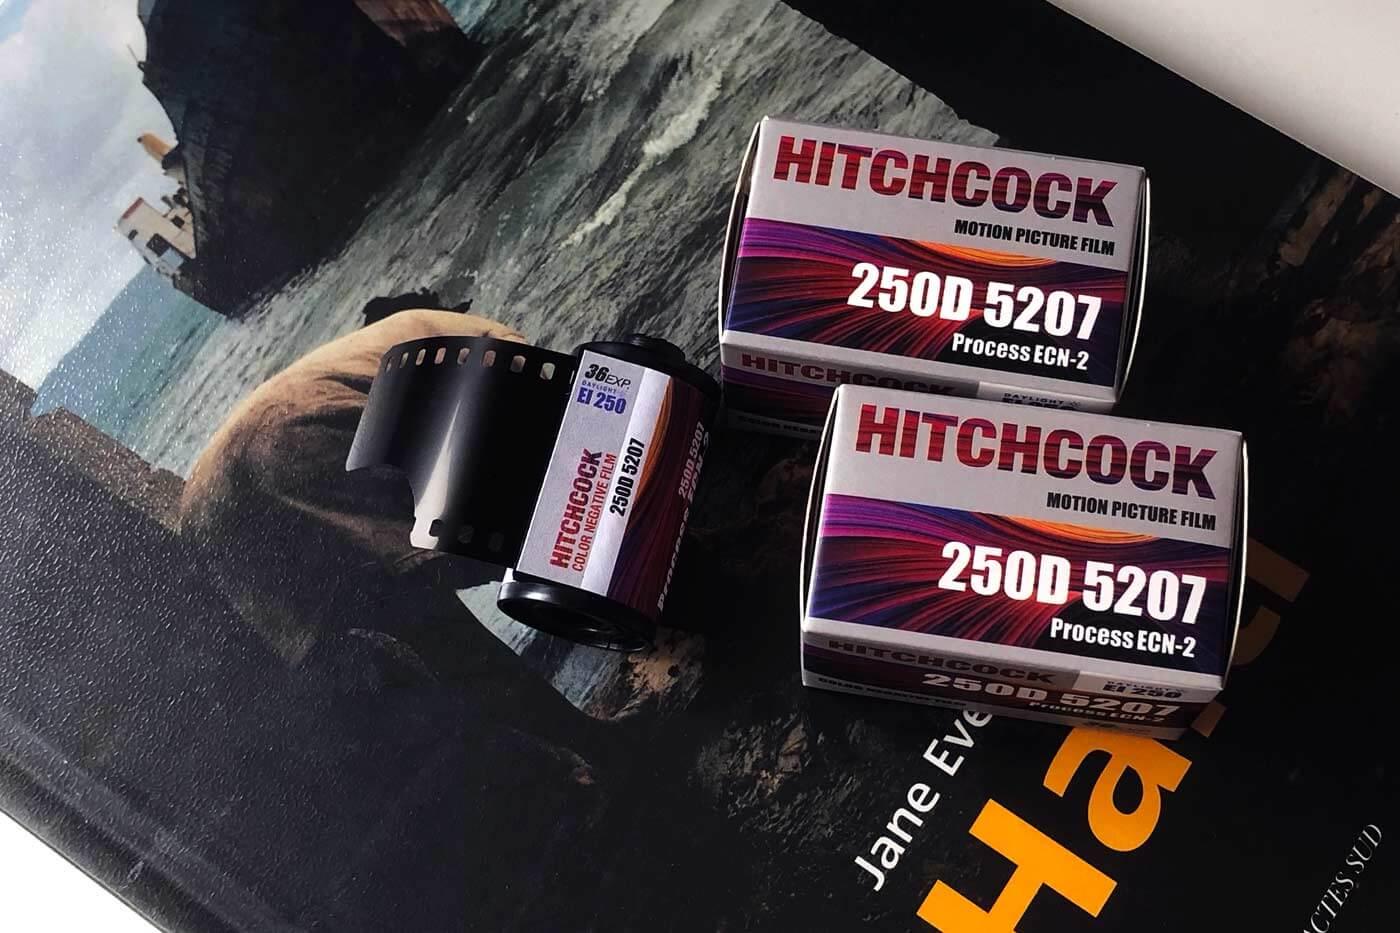 Analog-film-review-kodak-vision-3-5207-cine-movie-film-colour-negative-photography-250D-daylight-250-iso-develop-ecn2-remjet-ecn-2-shootfilm-cover